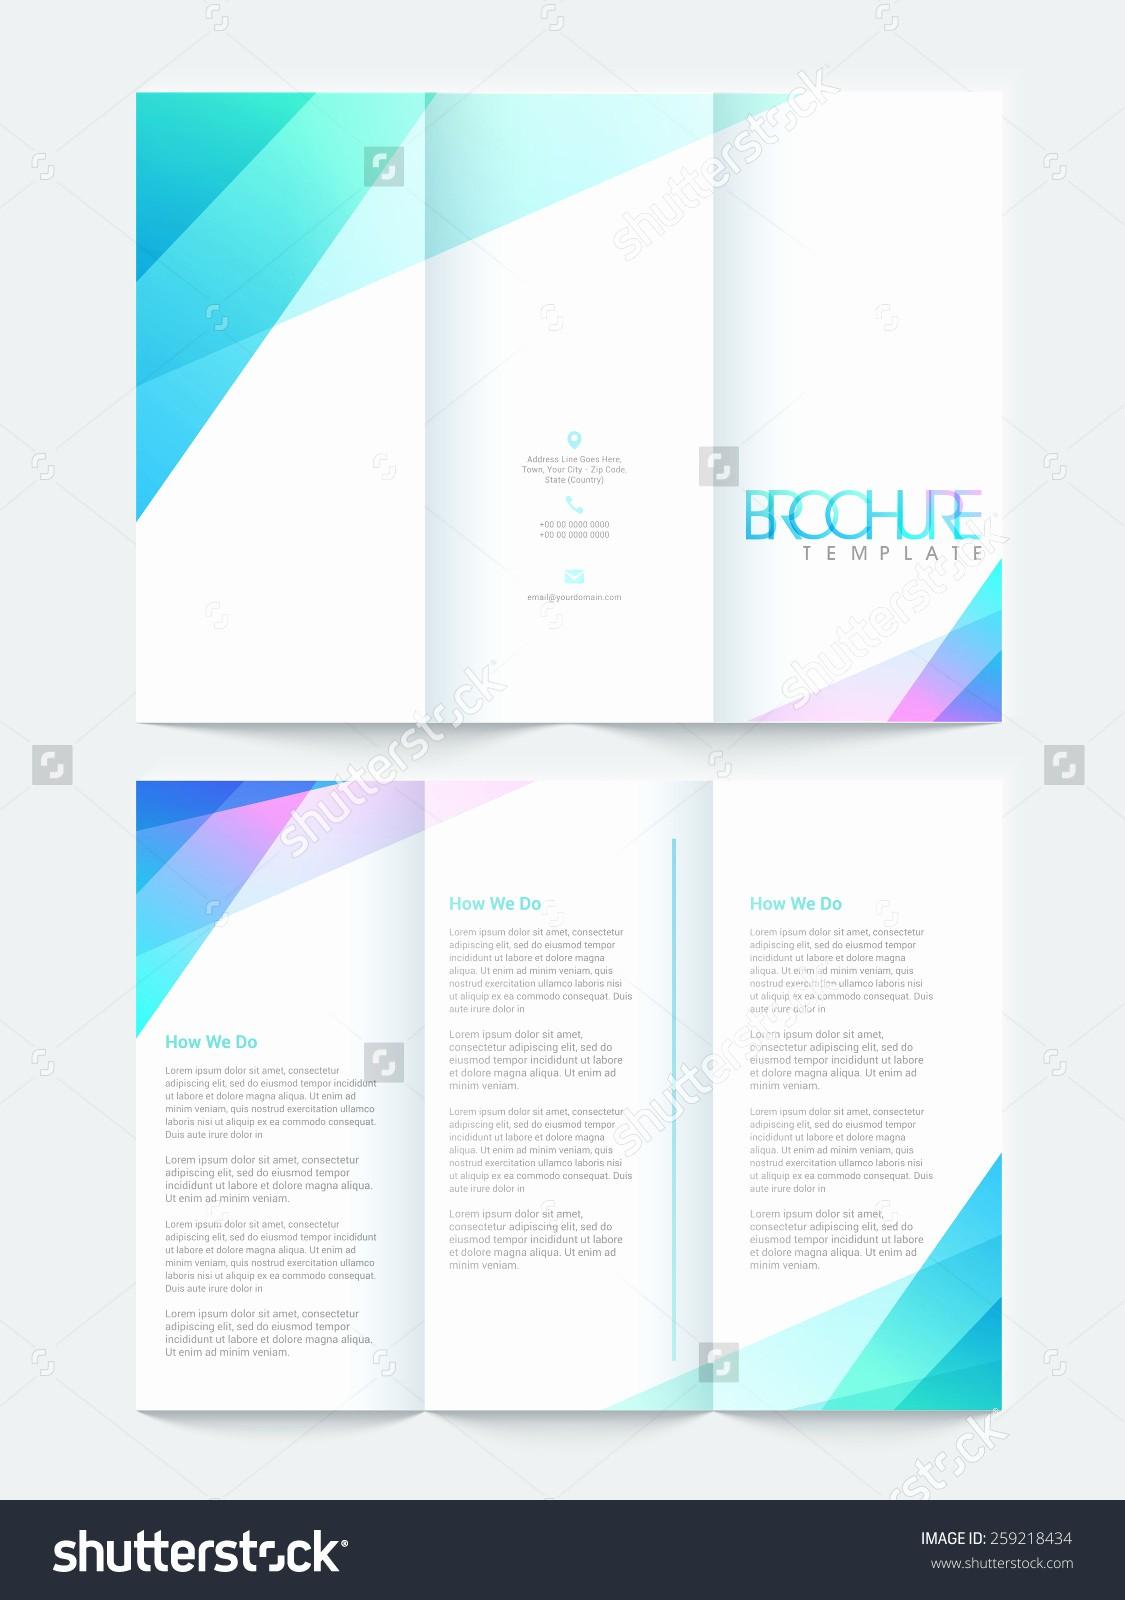 Free Brochure Templates for Mac Beautiful Brochure Templates Mac Elegant Pages Pri Free Psd